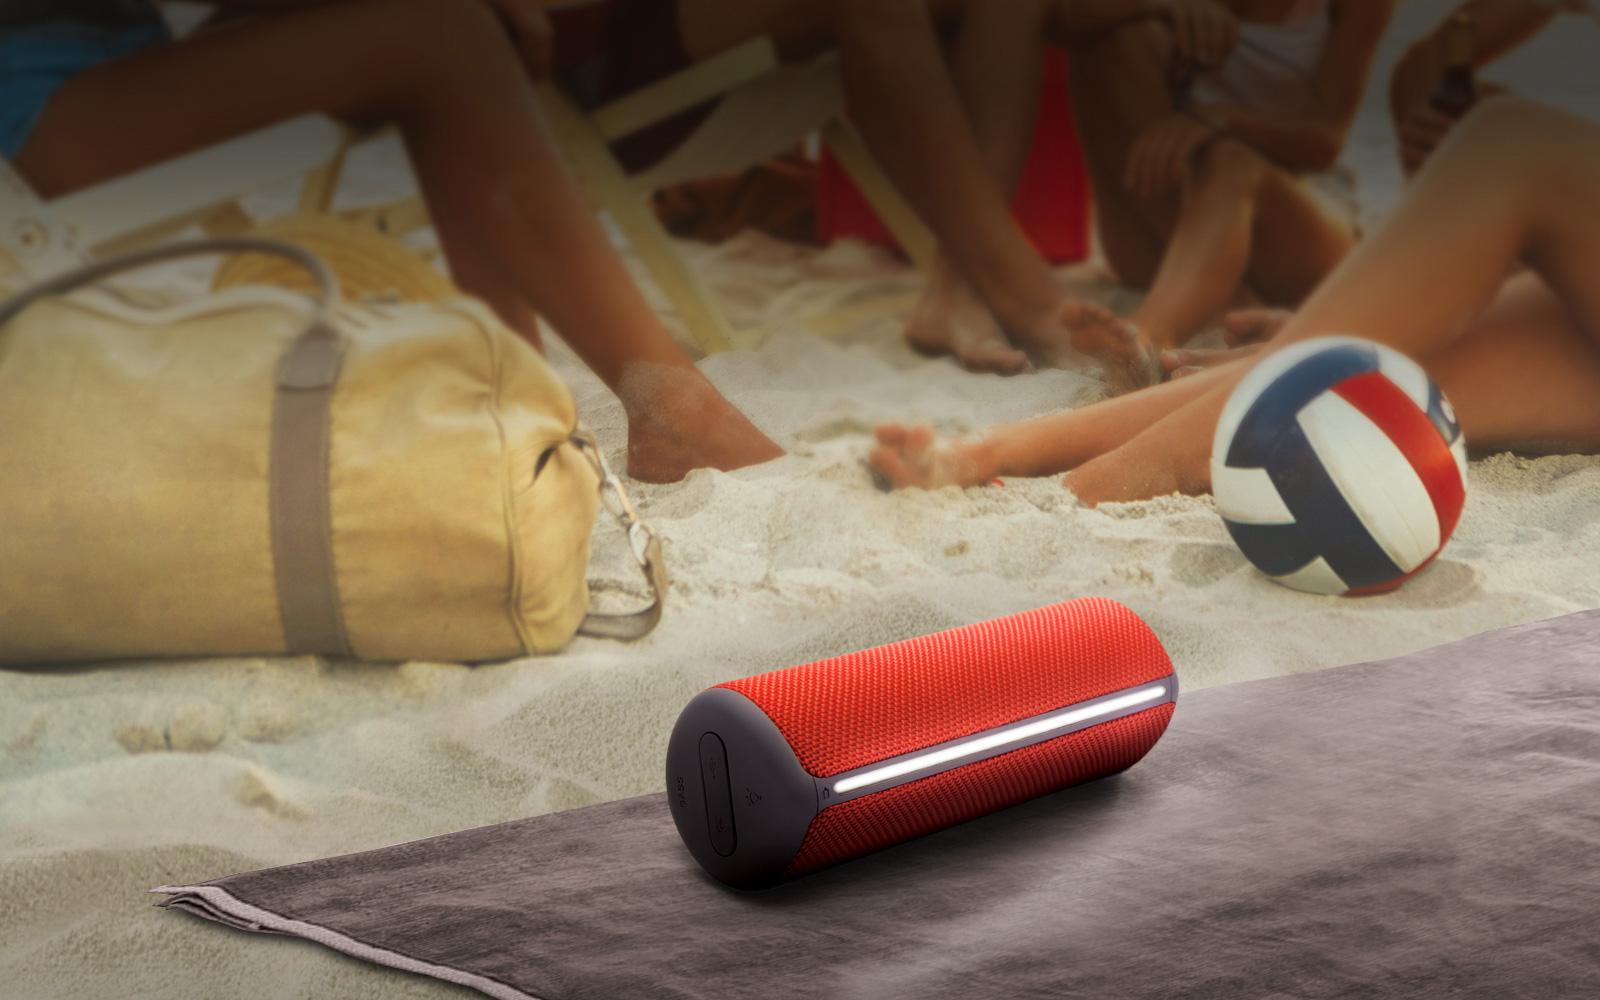 Lg Bocina Ph4 16 Watts Multi Bluetooth Viu Tienda Online # Muebles Viu Recamaras